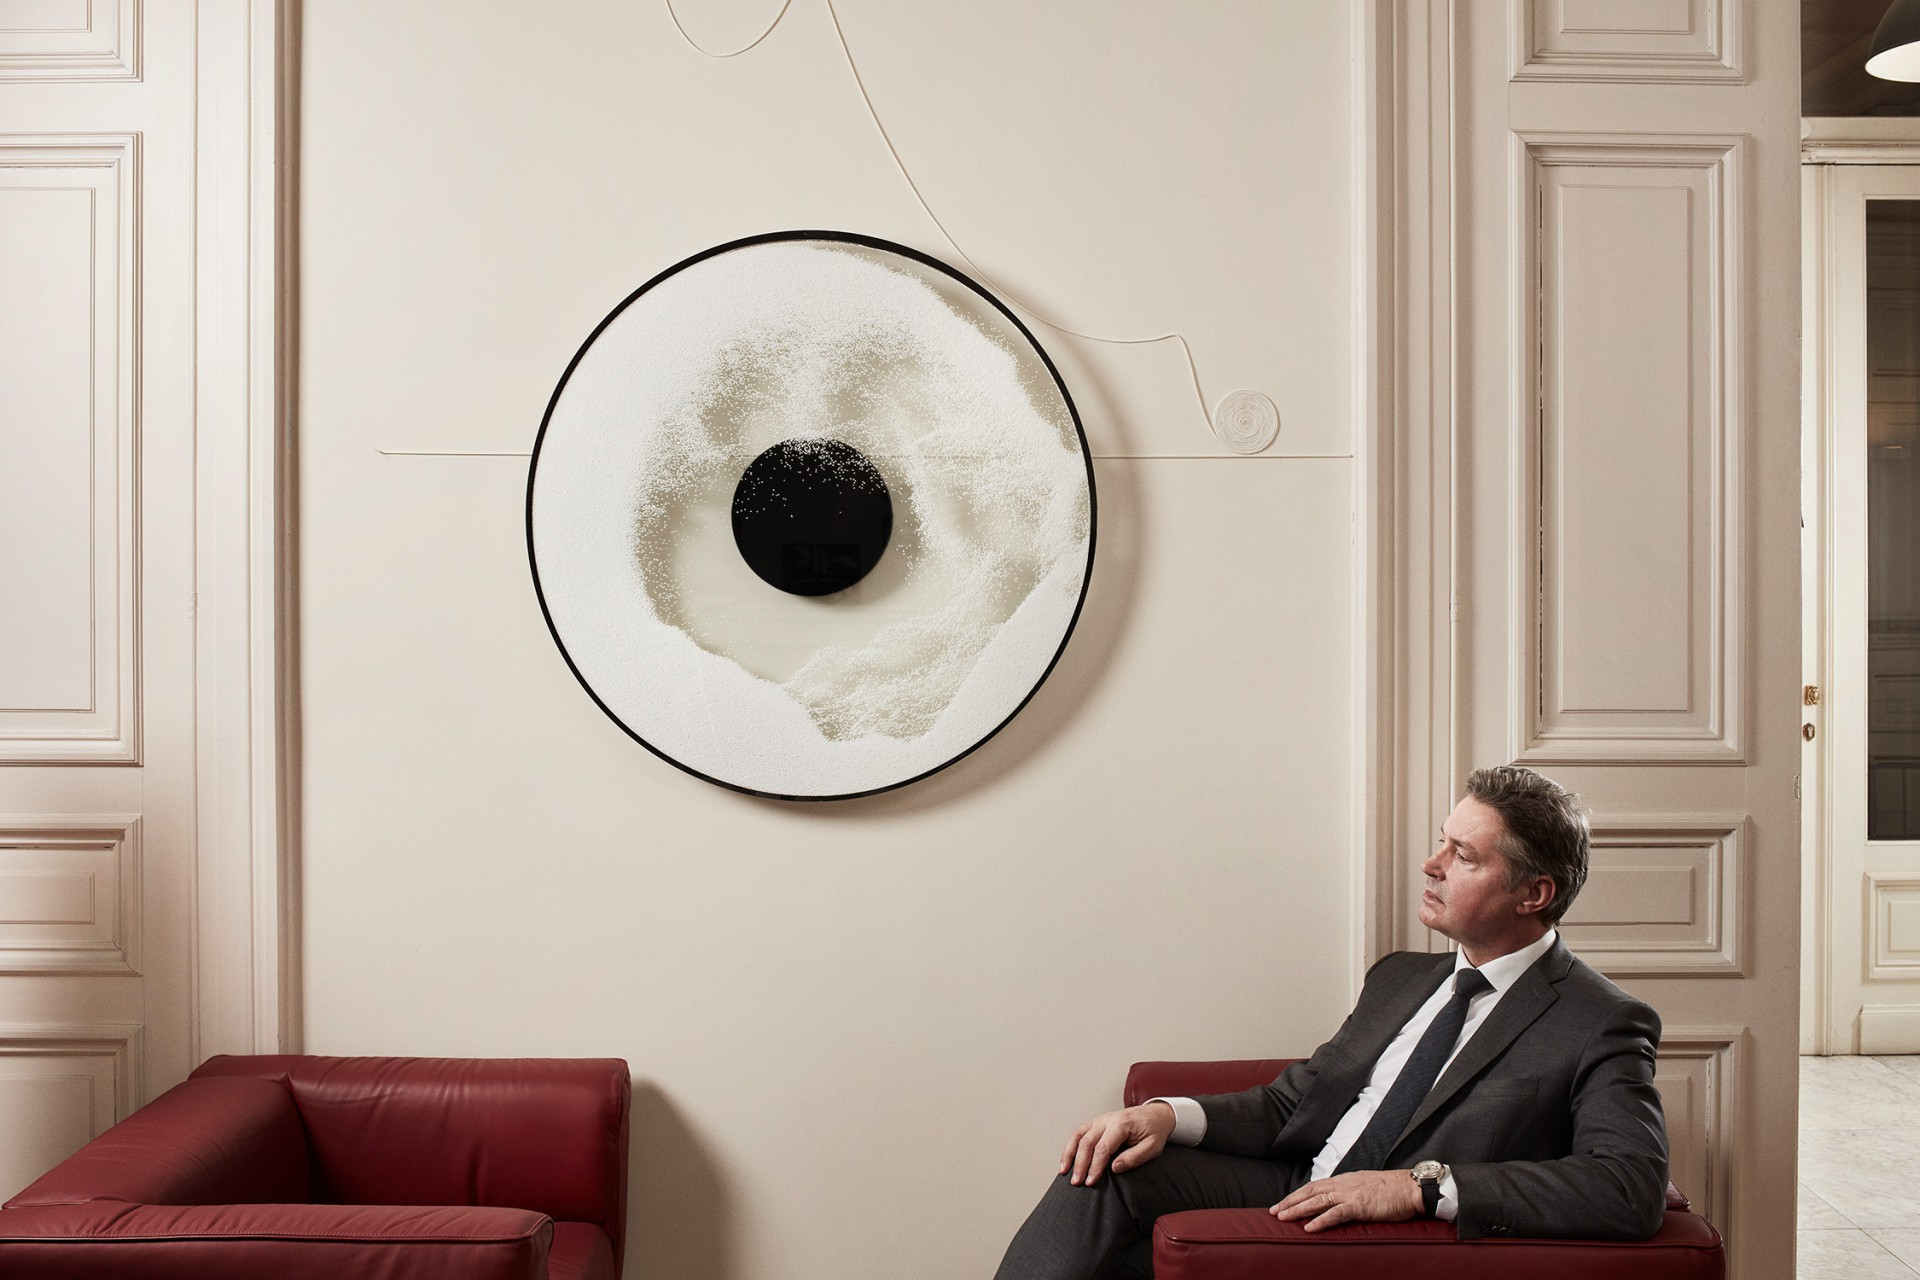 AVANTGAND - Zoob: Frank Schelstraete <br /> interactive installation by Honoré d'O